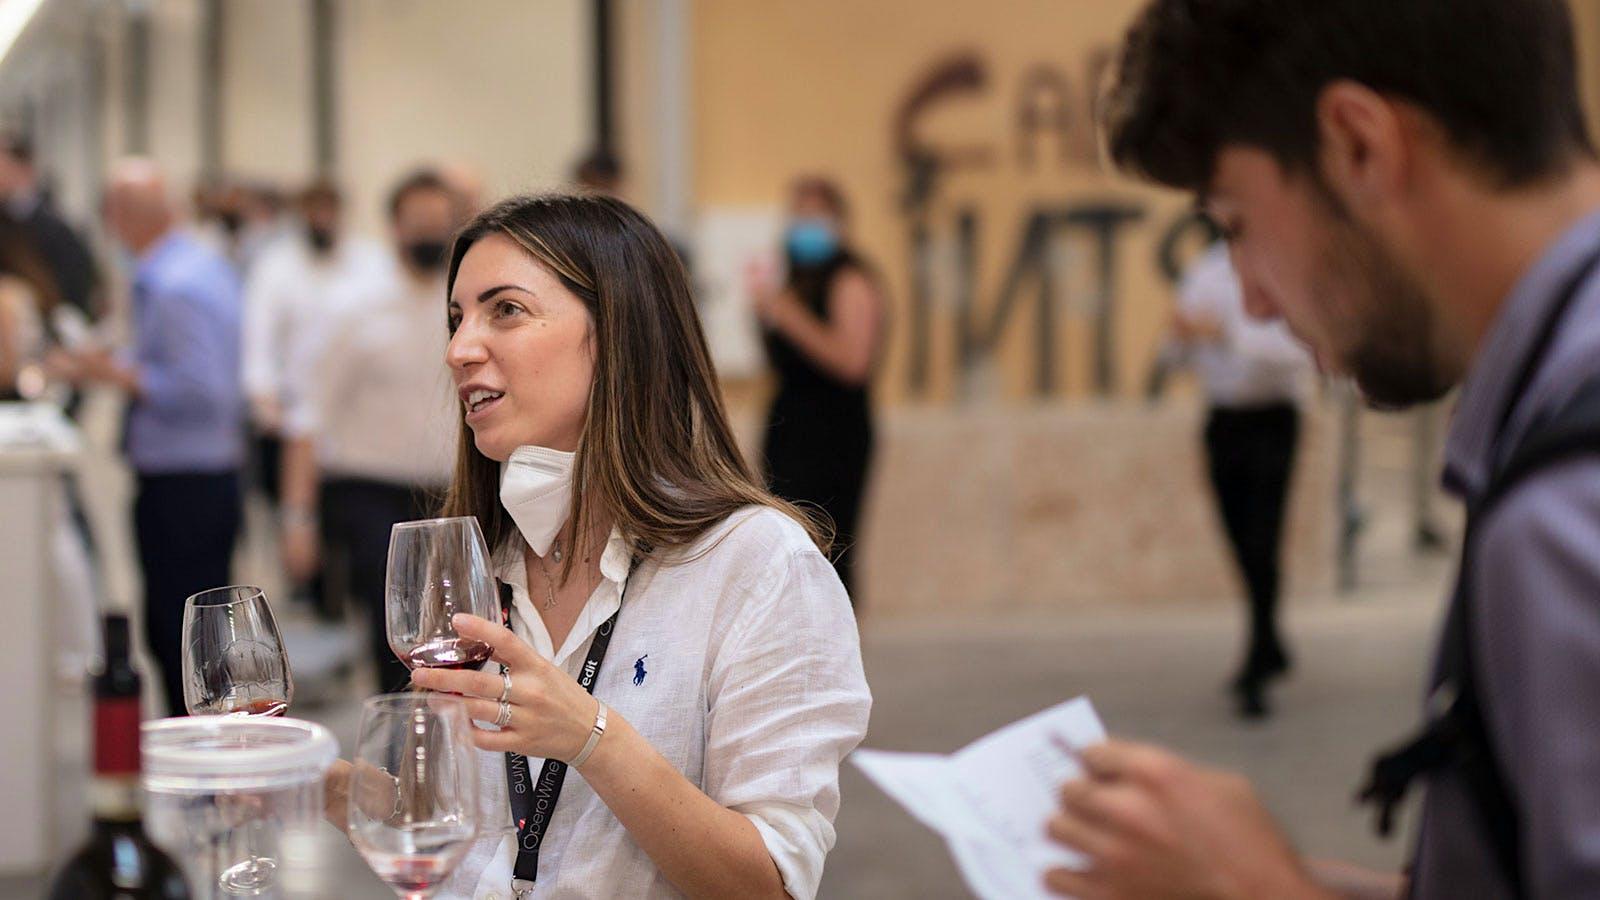 An Italian Resurgence: OperaWine Unites Top Winemakers for a Gala Tasting in Verona